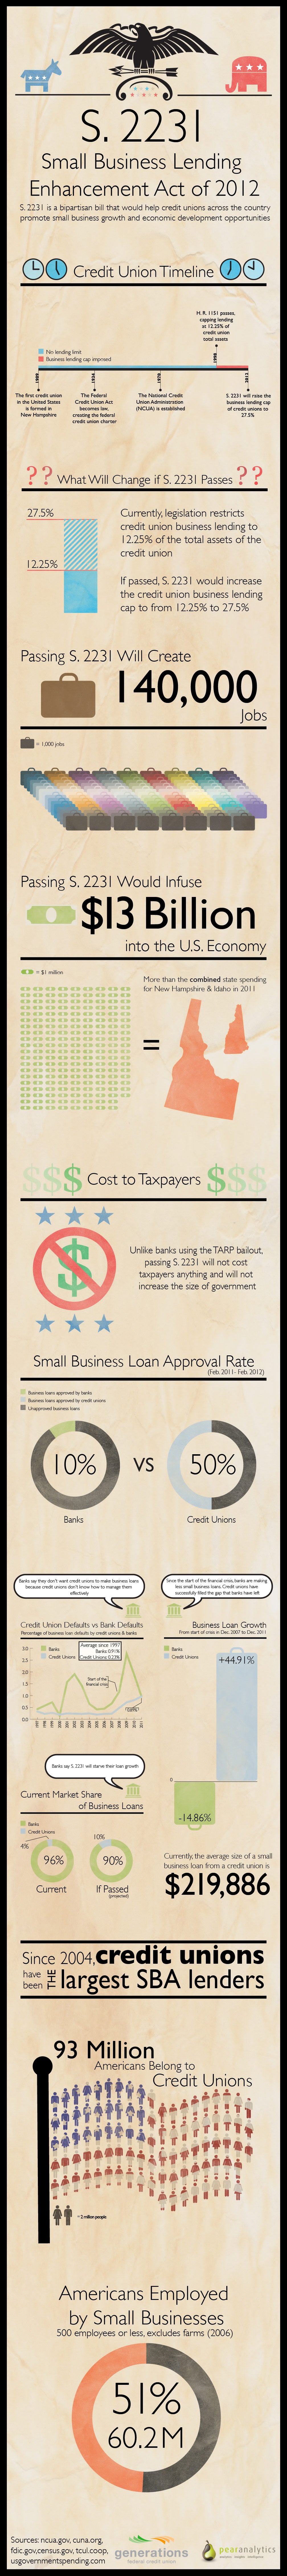 Enhancing Small Business Lending